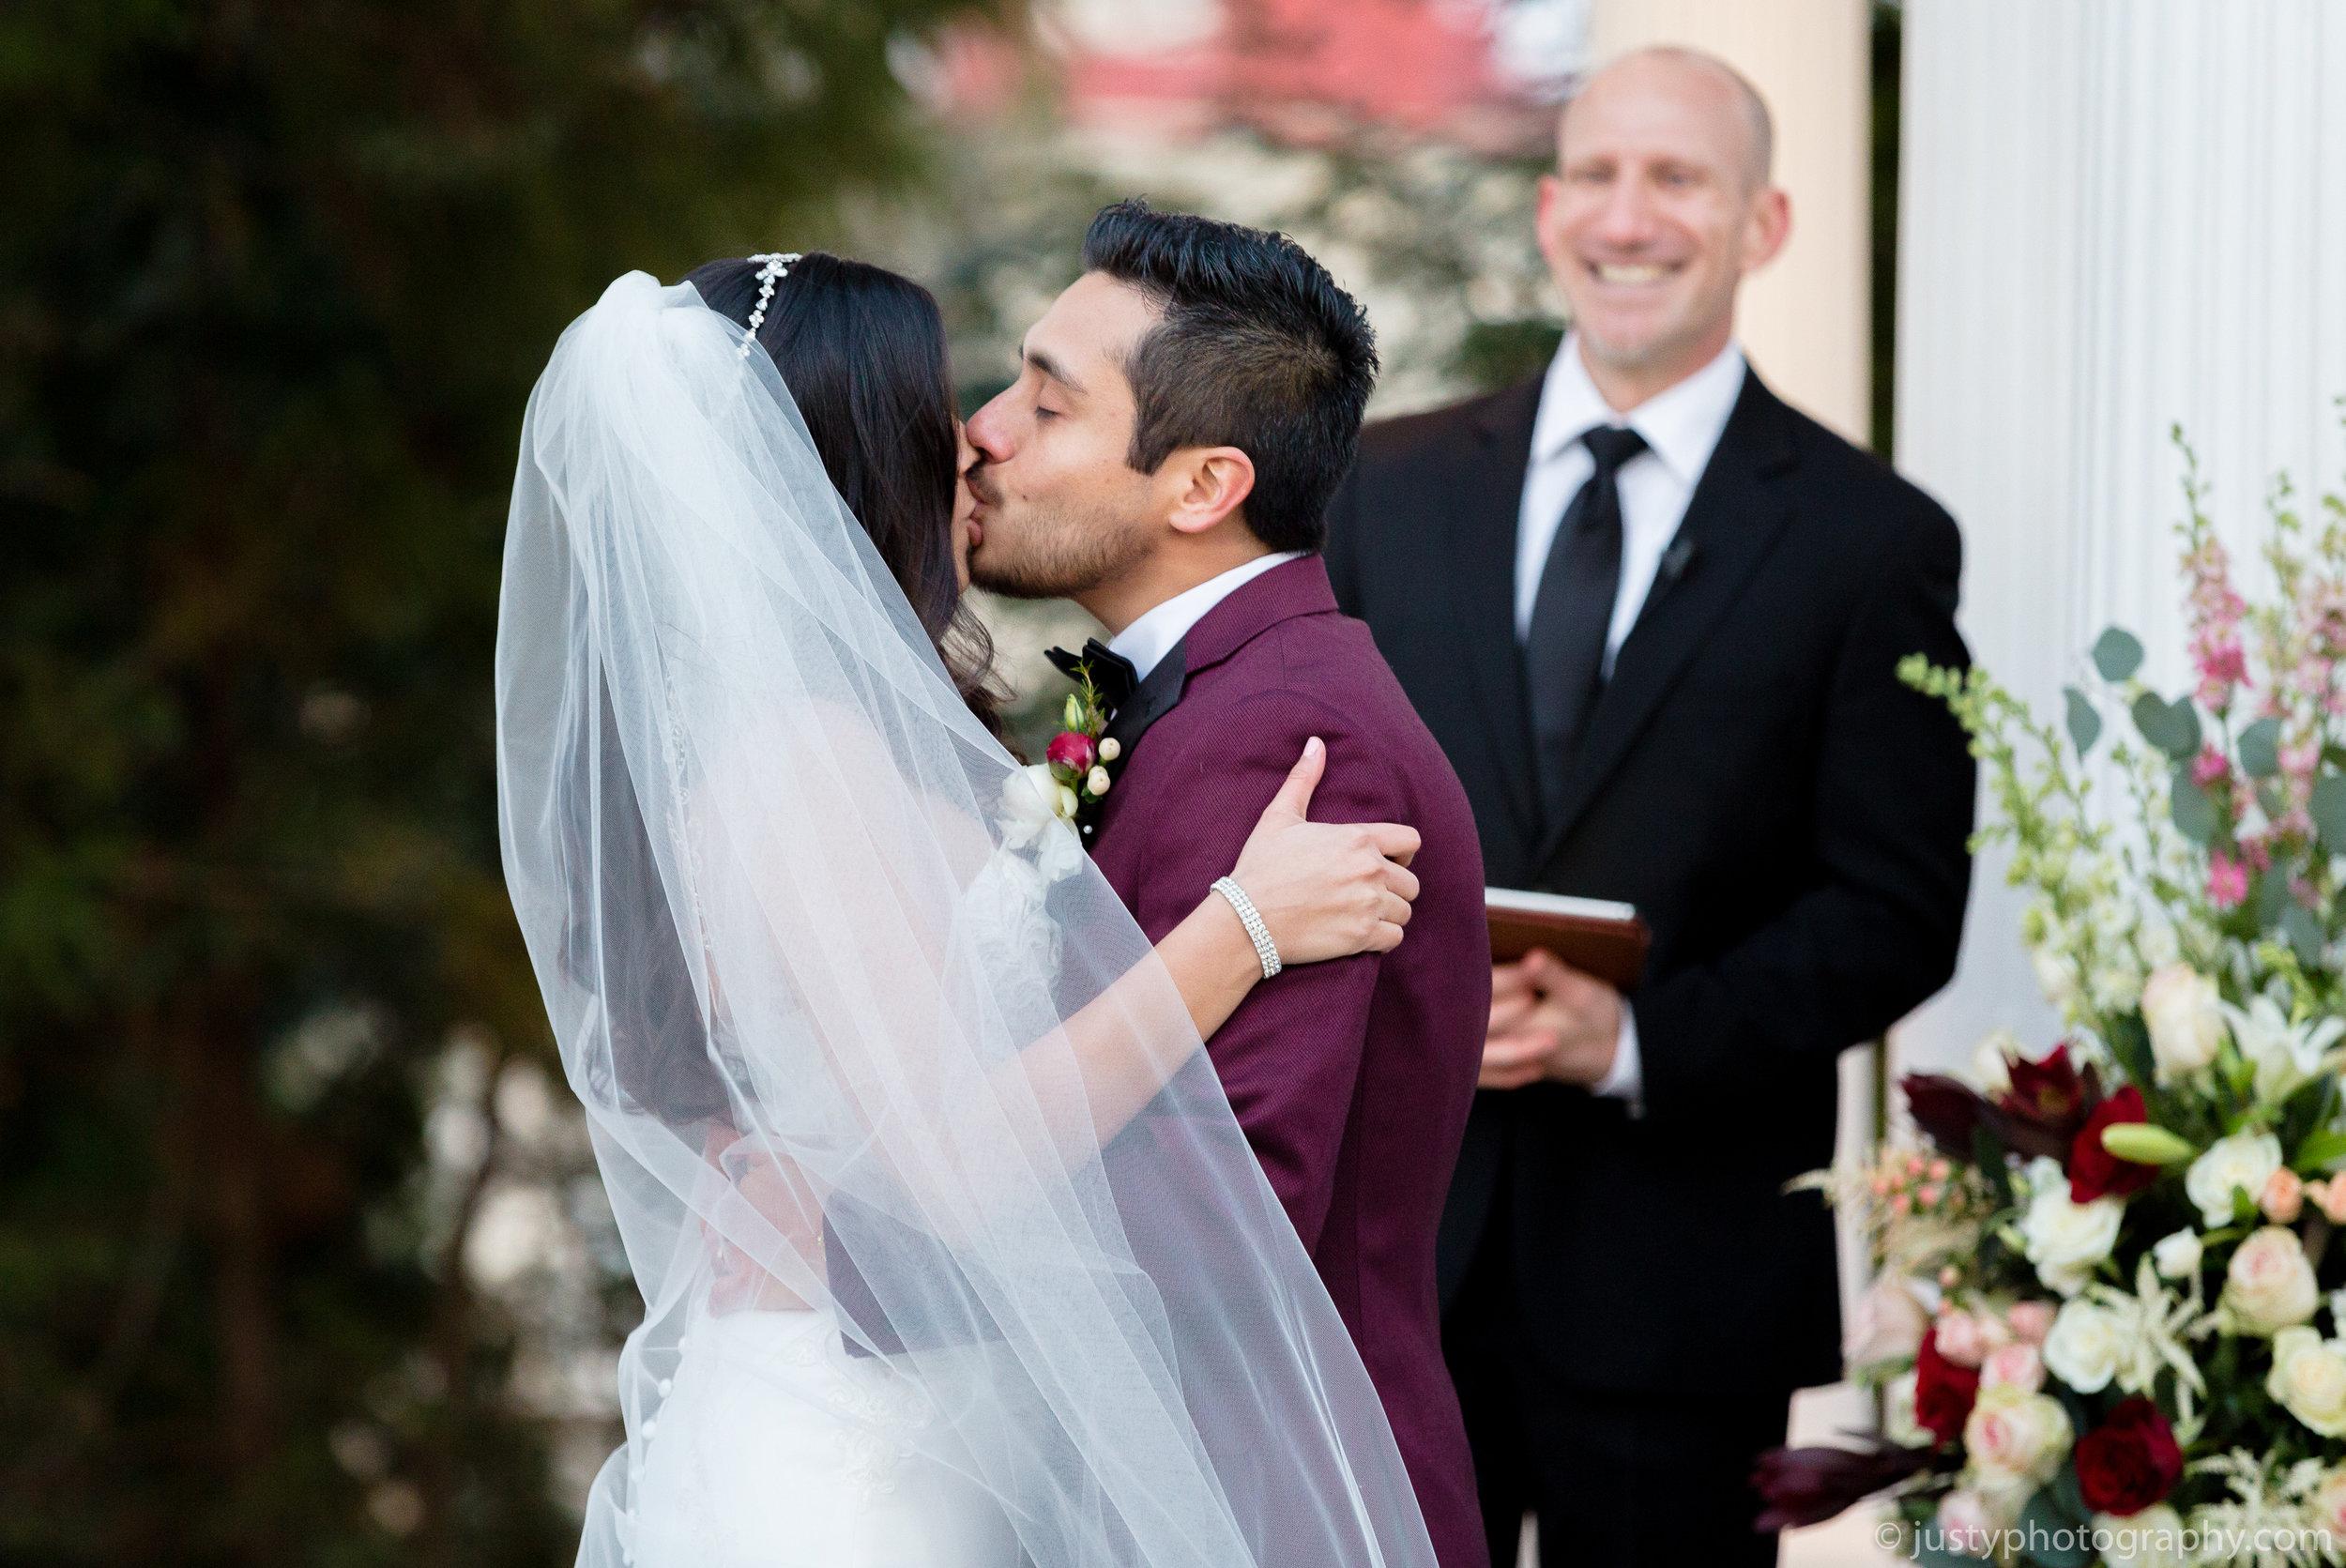 Ceresville Mansion Wedding Photos - The Kiss.jpg